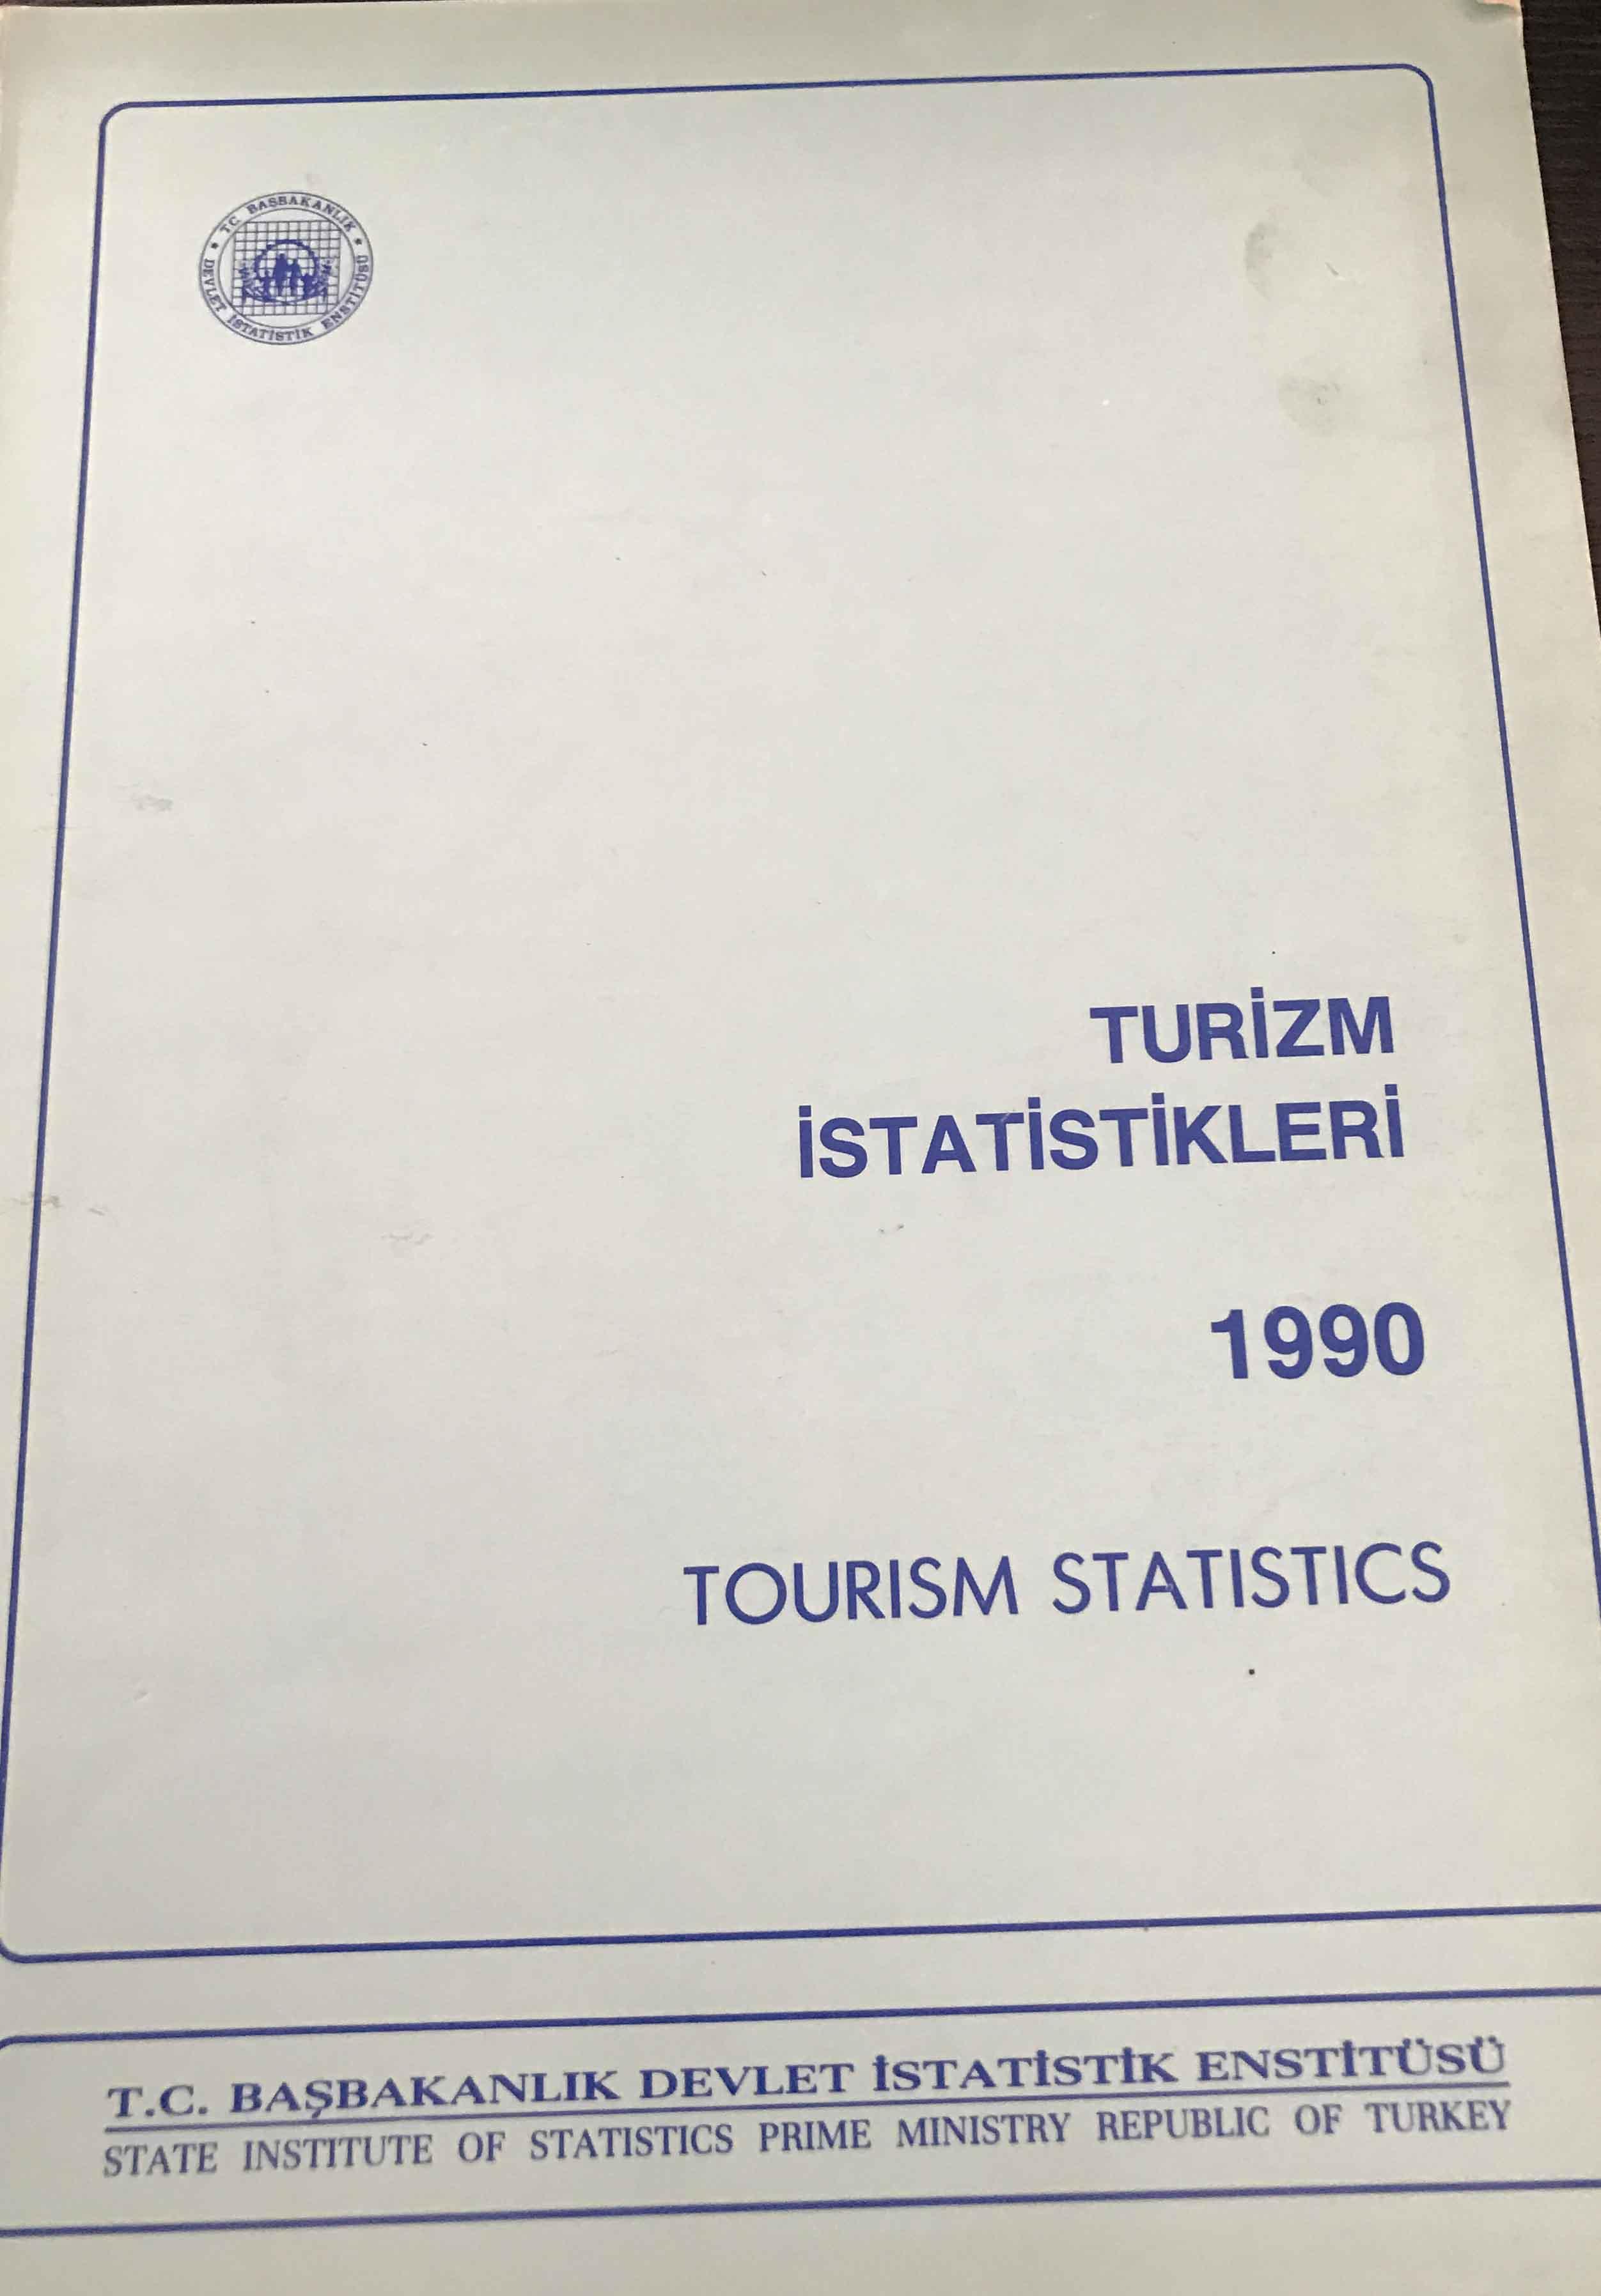 Turizm İstatistikleri 1990 Kitap Kapağı